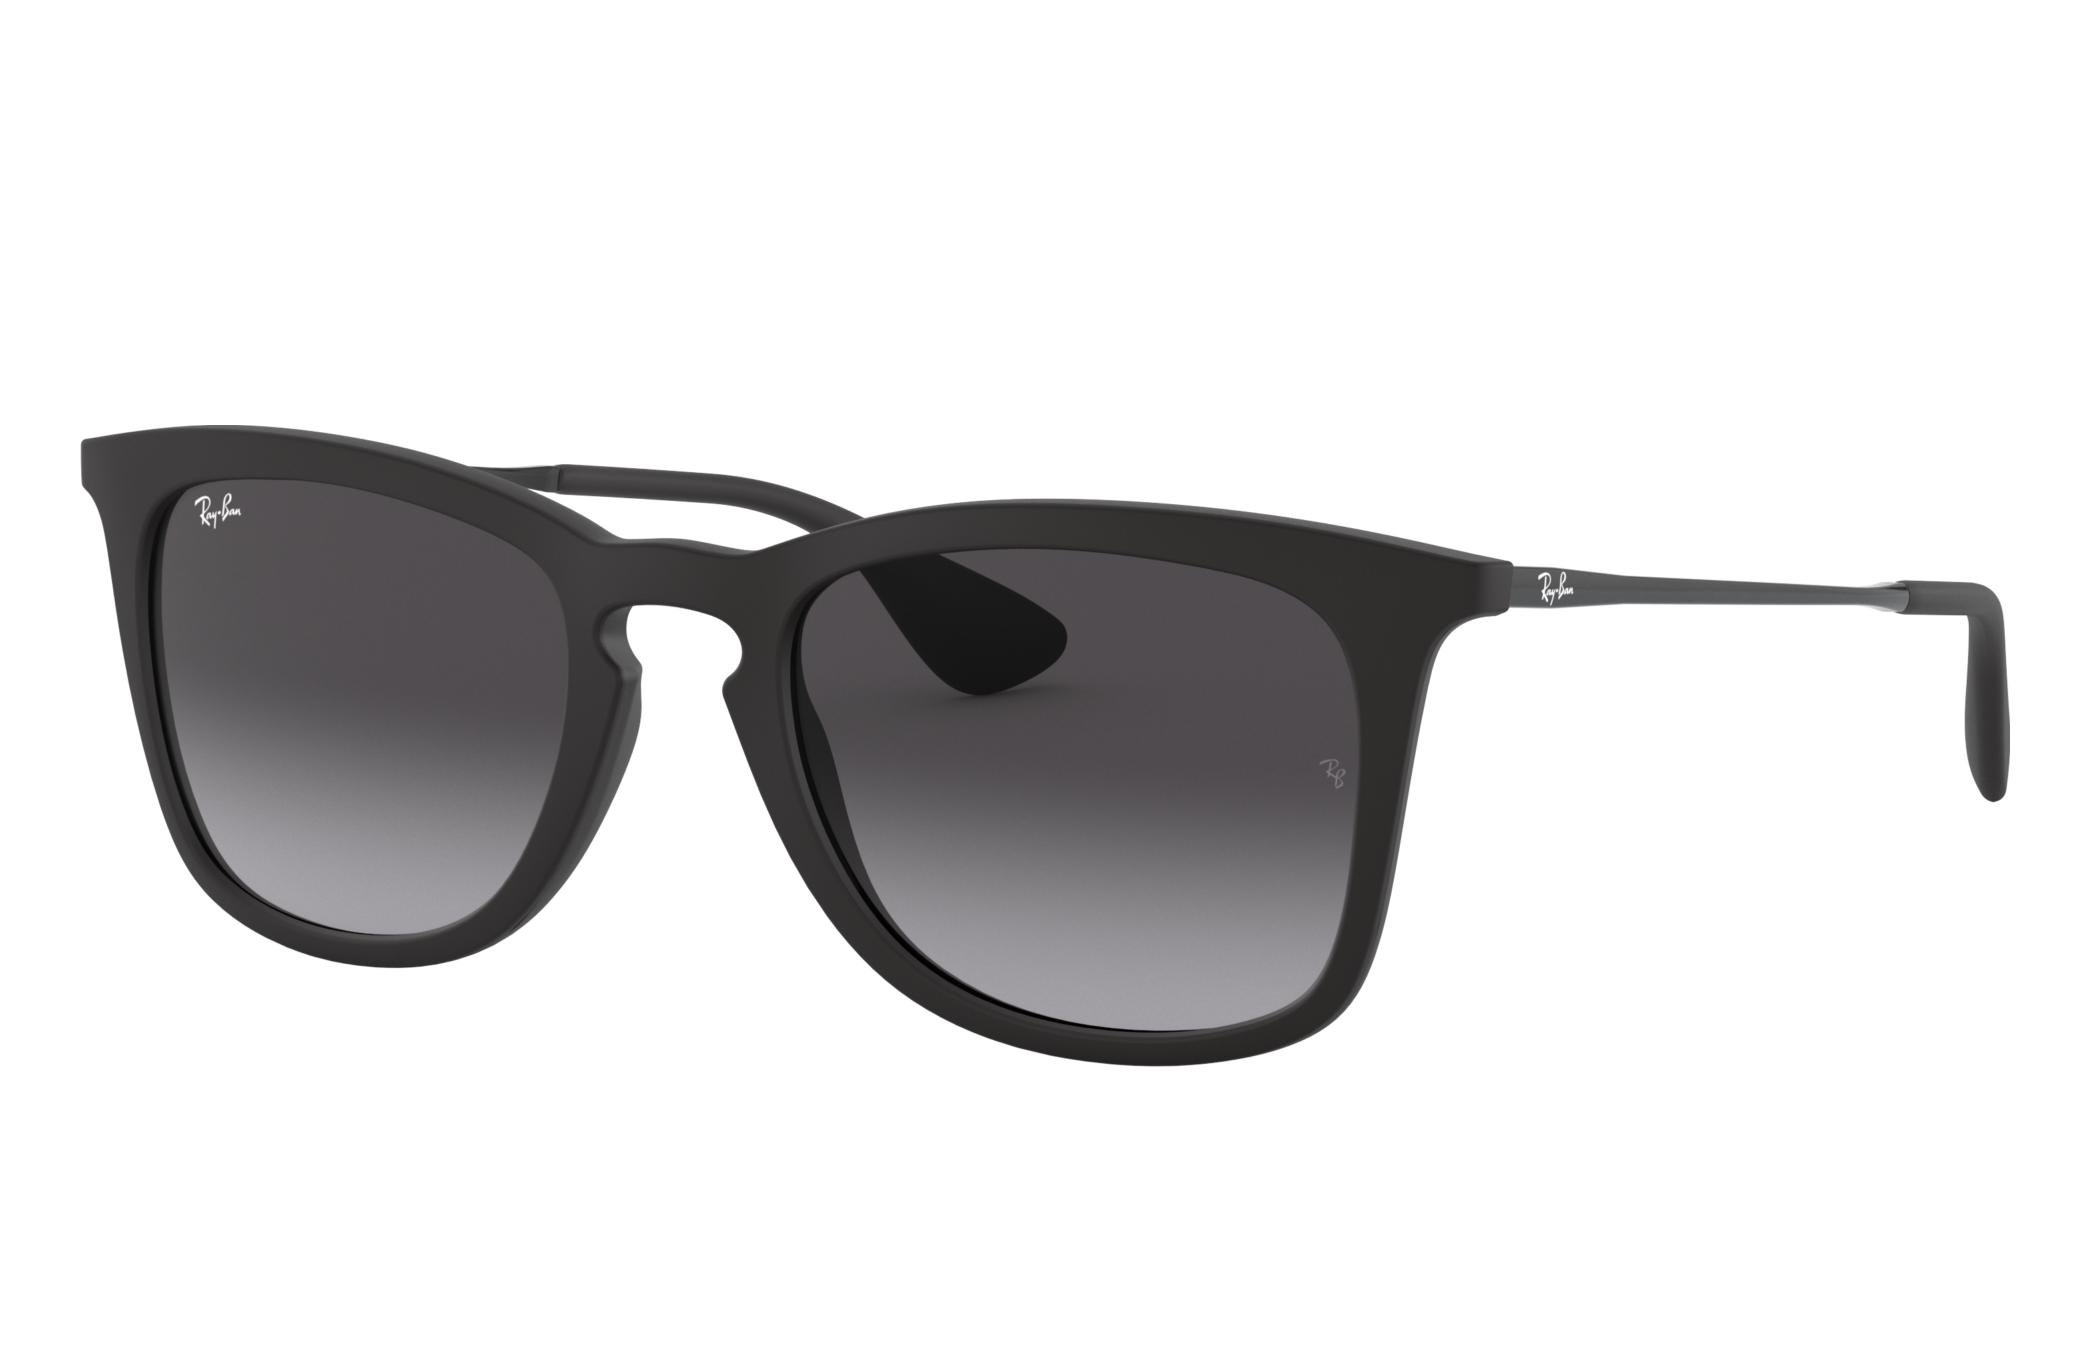 Ray-Ban Rb4221 Black, Gray Lenses - RB4221